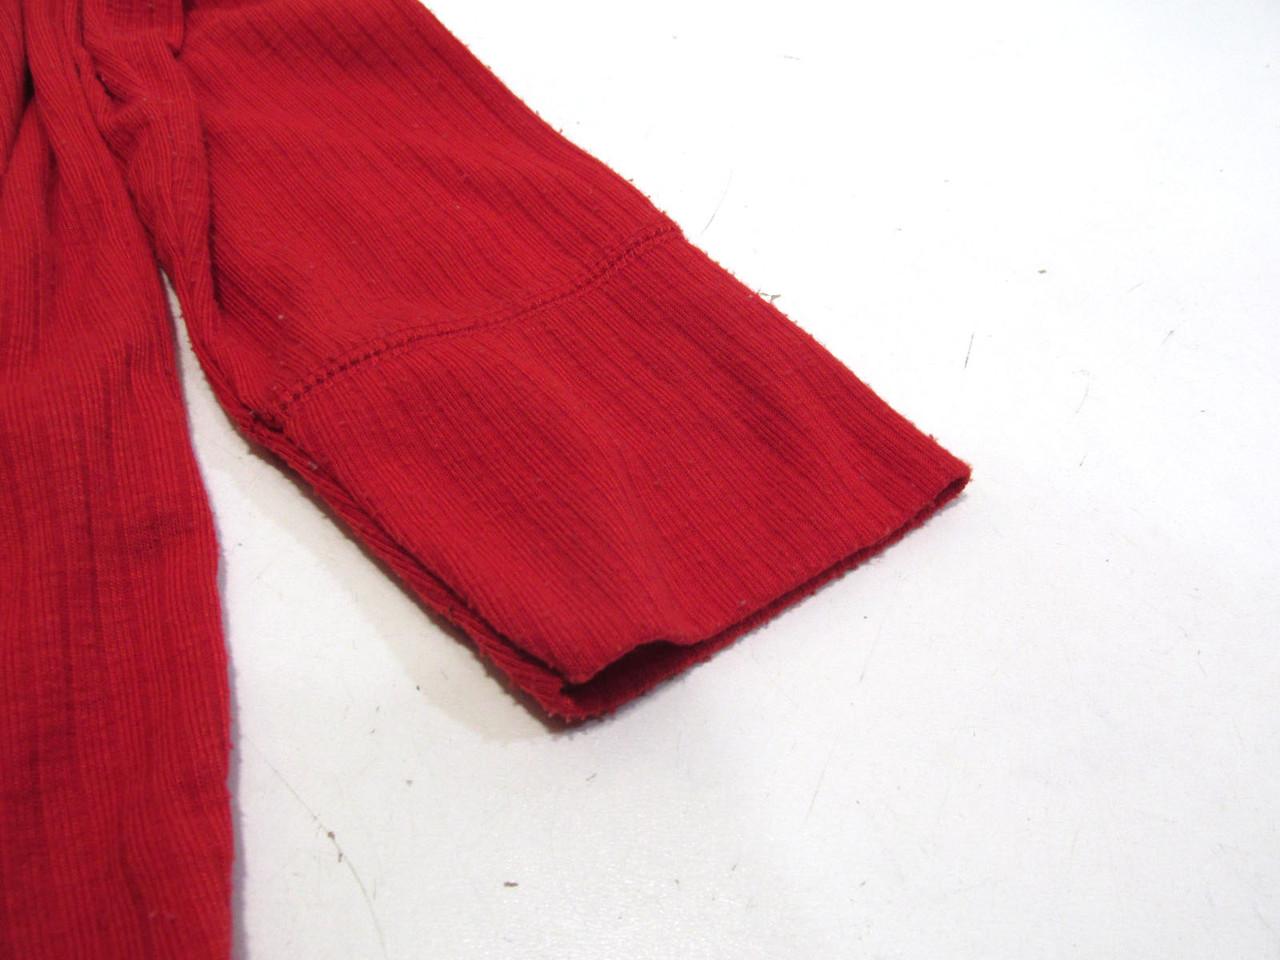 Термо кофта красная Phelix, М, Leyer 1, Хор сост! 6